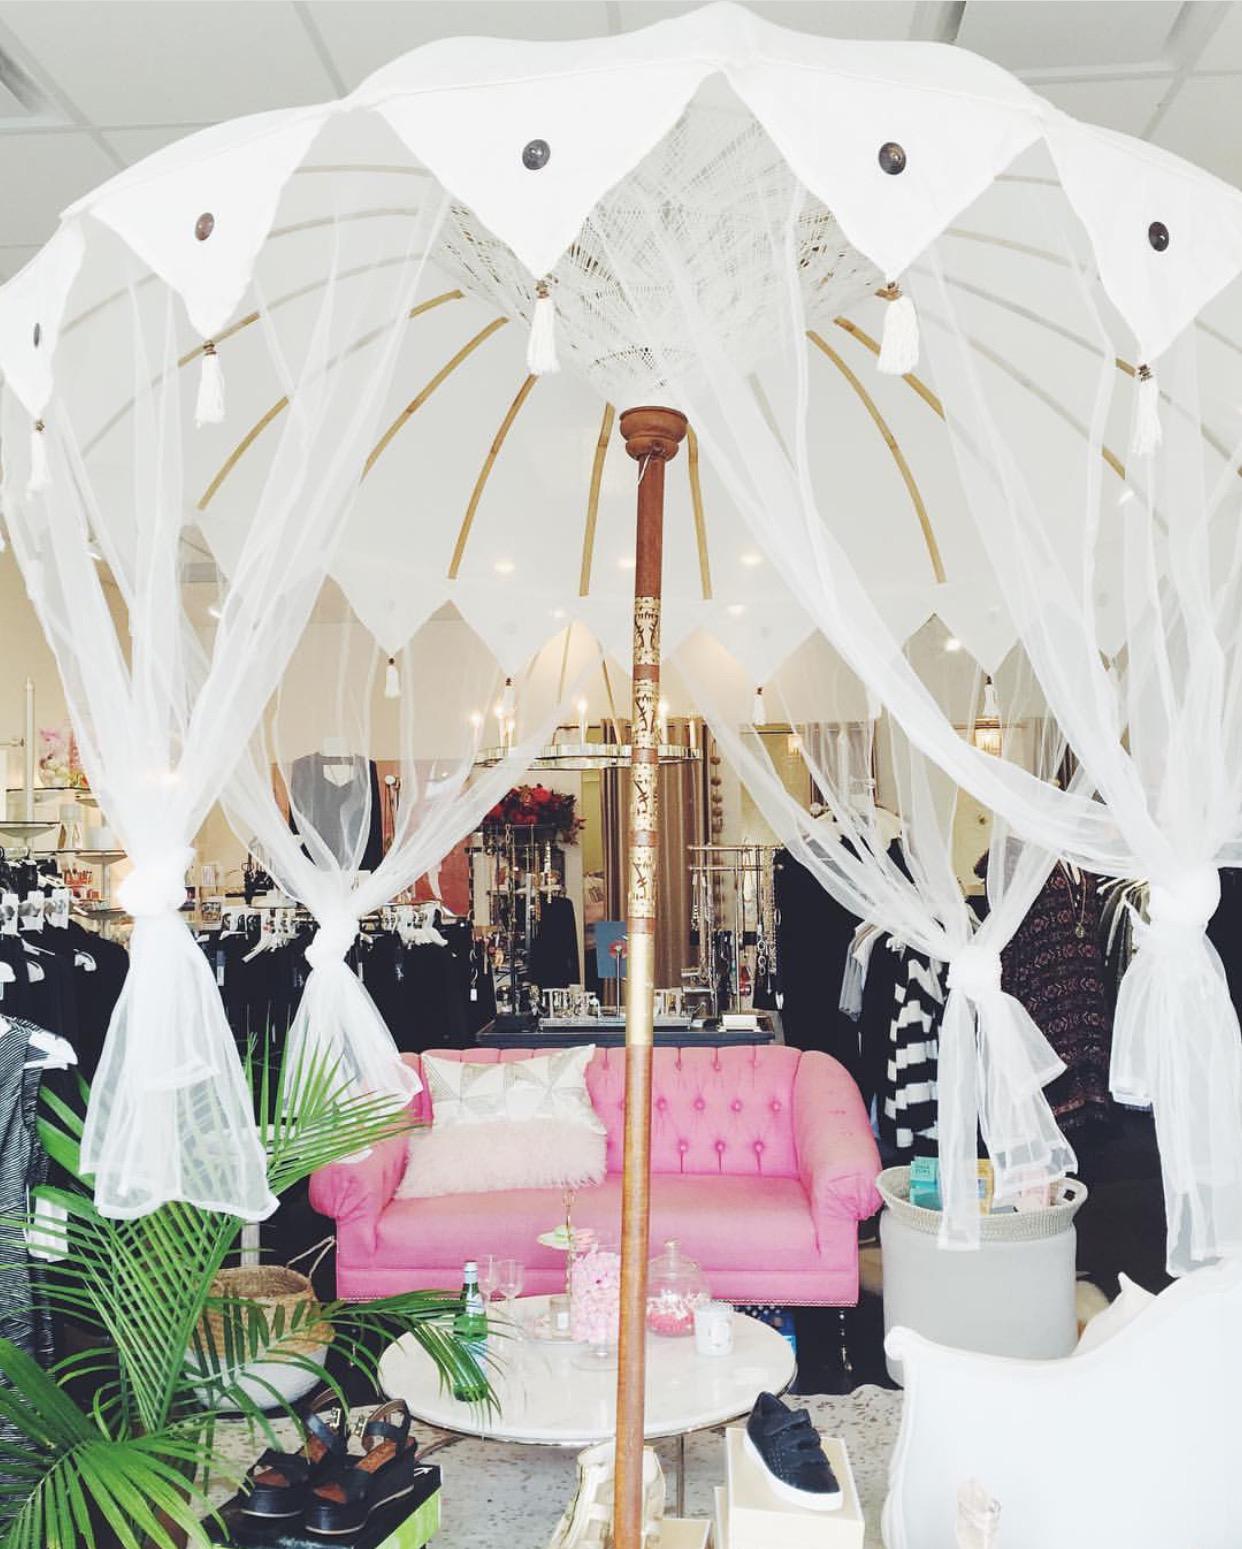 boutique-blanche-umbrella.jpg